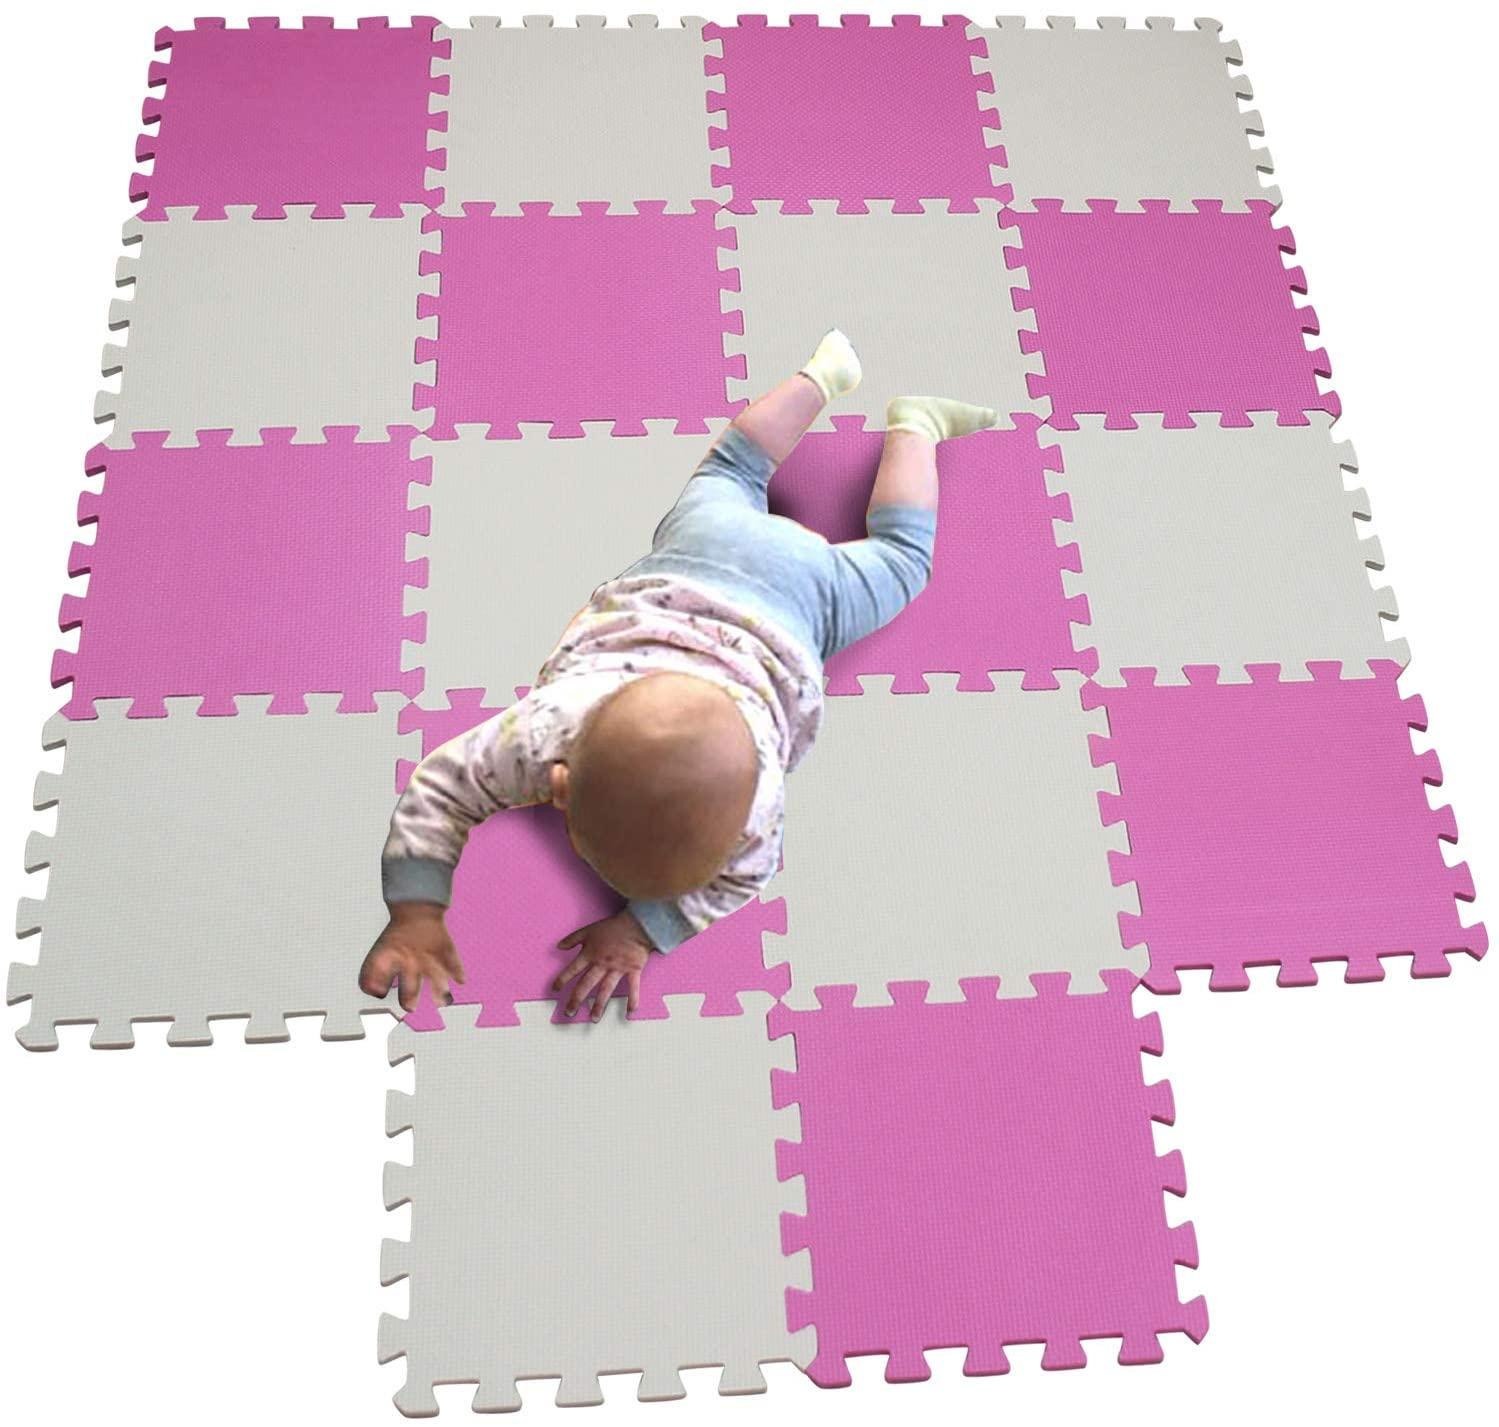 MQIAOHAM Children Puzzle mat Play mat Squares Play mat Tiles Baby mats for Floor Puzzle mat Soft Play mats Girl playmat Carpet Interlocking Foam Floor mats for Baby White Pink 101103